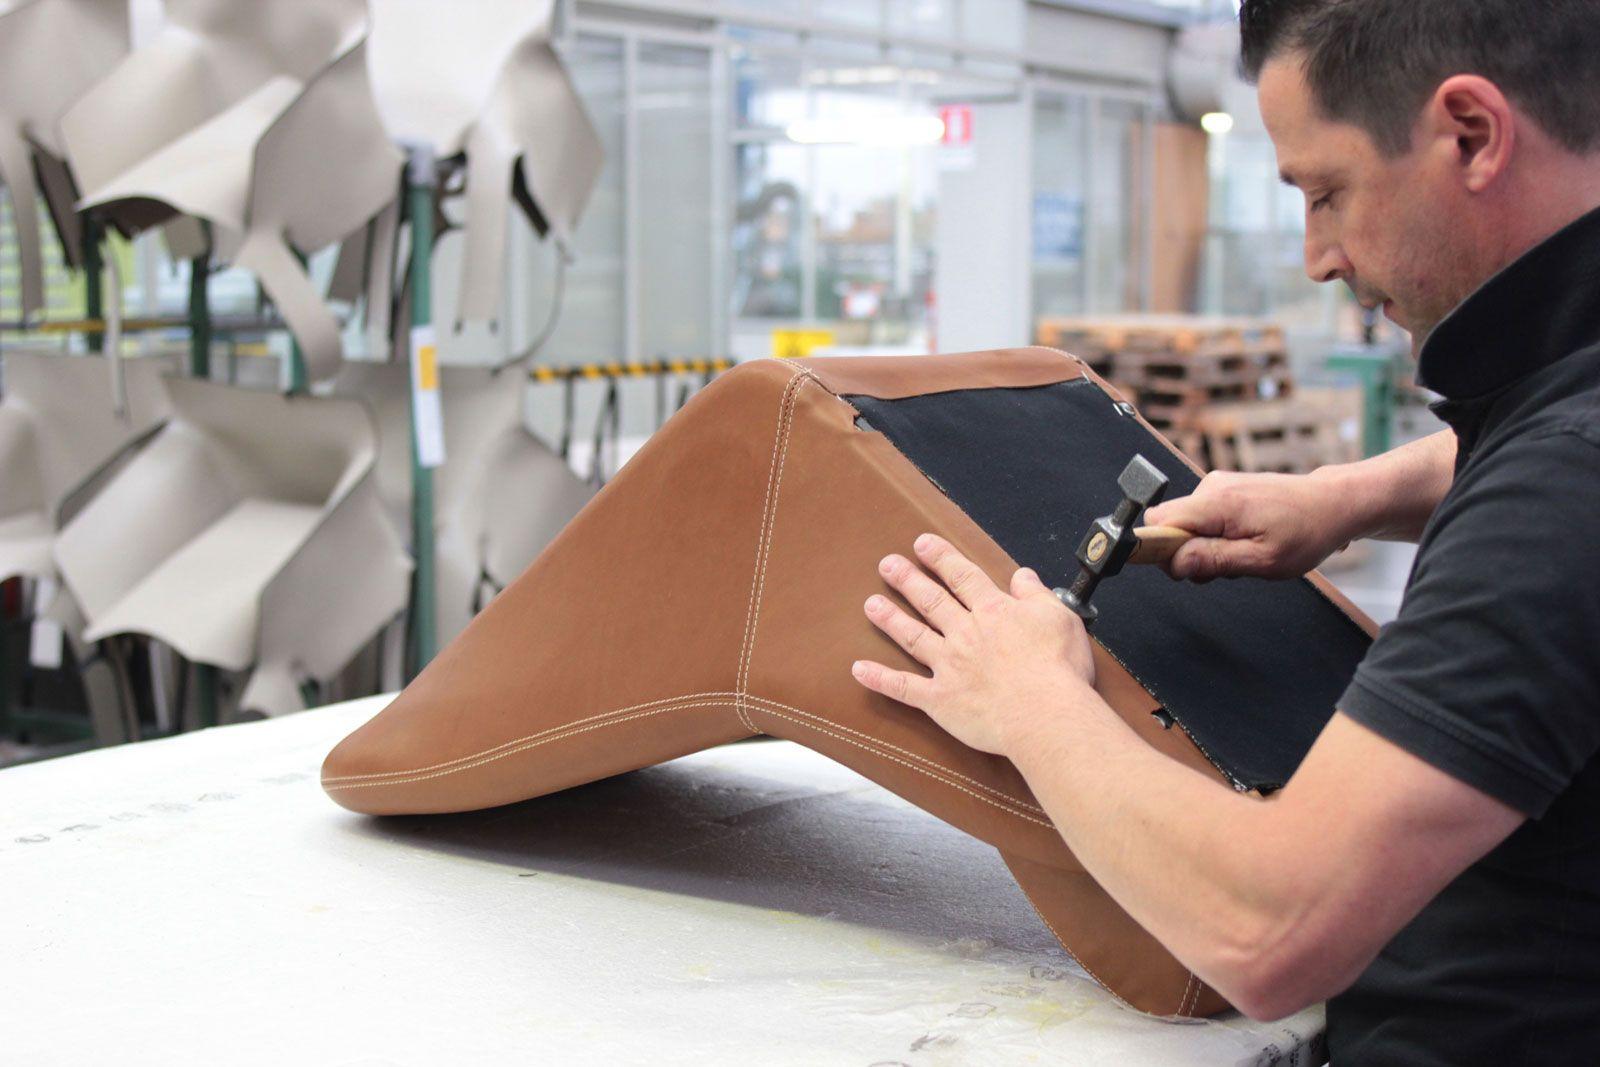 Effeffe Berlinetta Interior - Manufacturing Process at Matteograssi